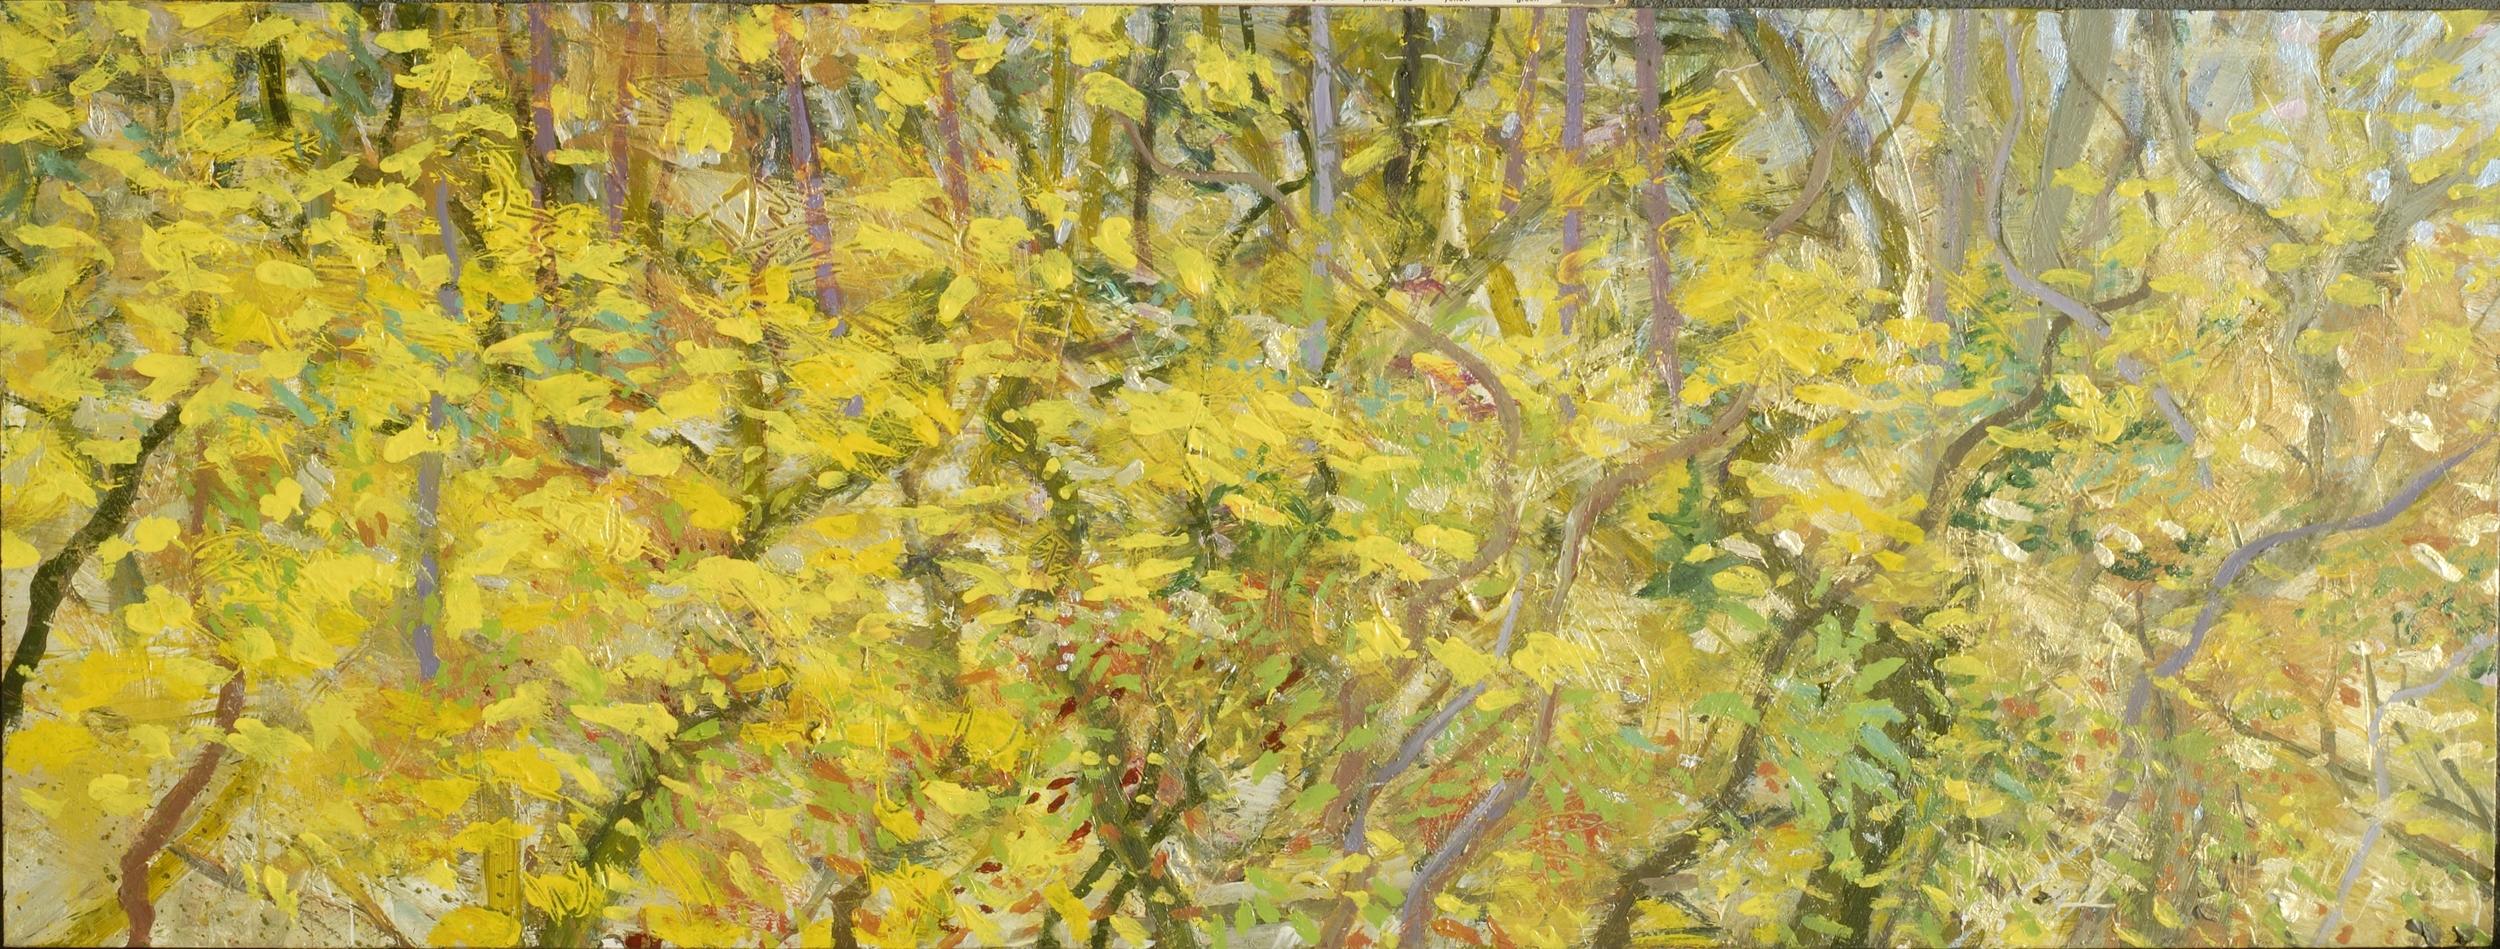 Fall Woodland